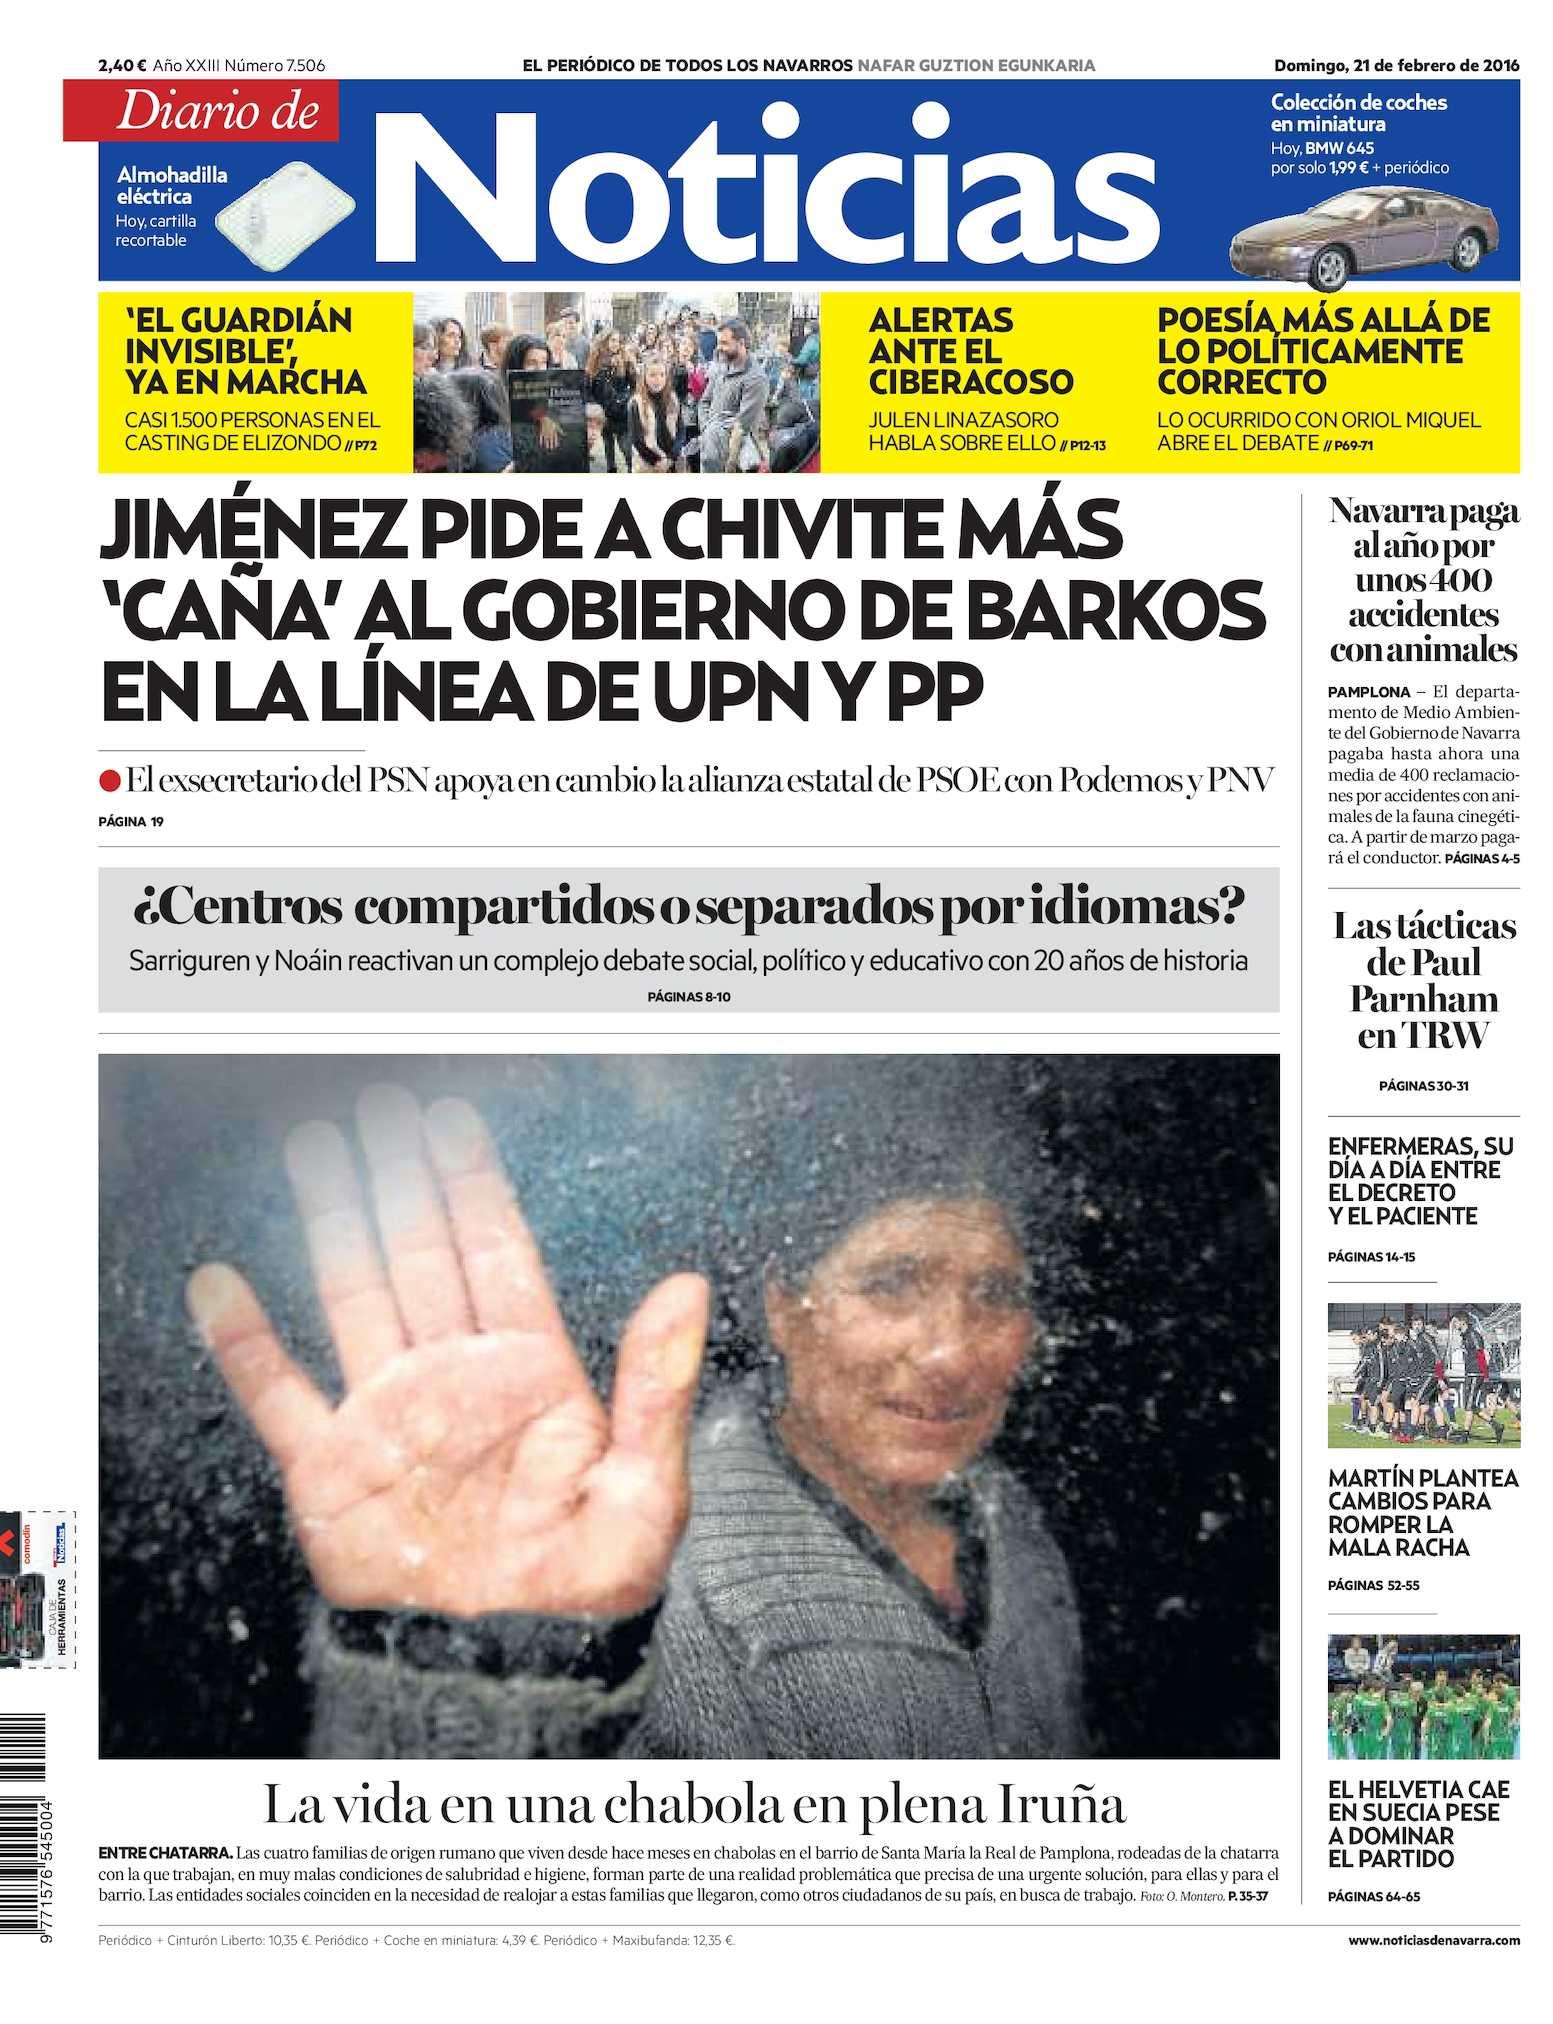 Calaméo - Diario de Noticias 20160221 467f0f264b22